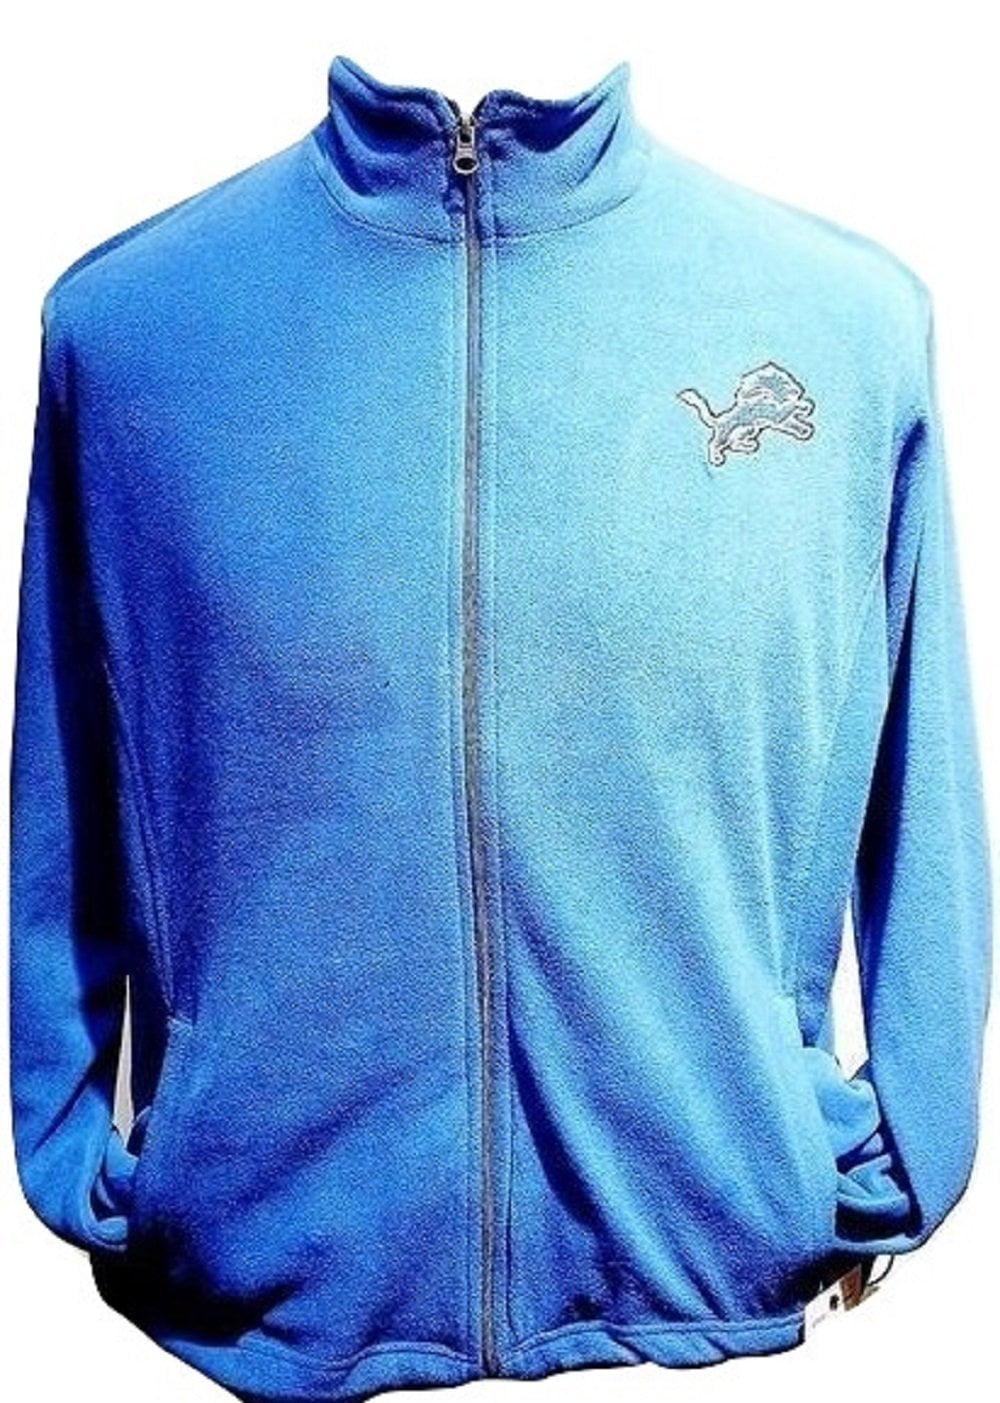 "Detroit Lions ""Shutout"" Lightweight Poly Fleece Jacket by G-III Sports"